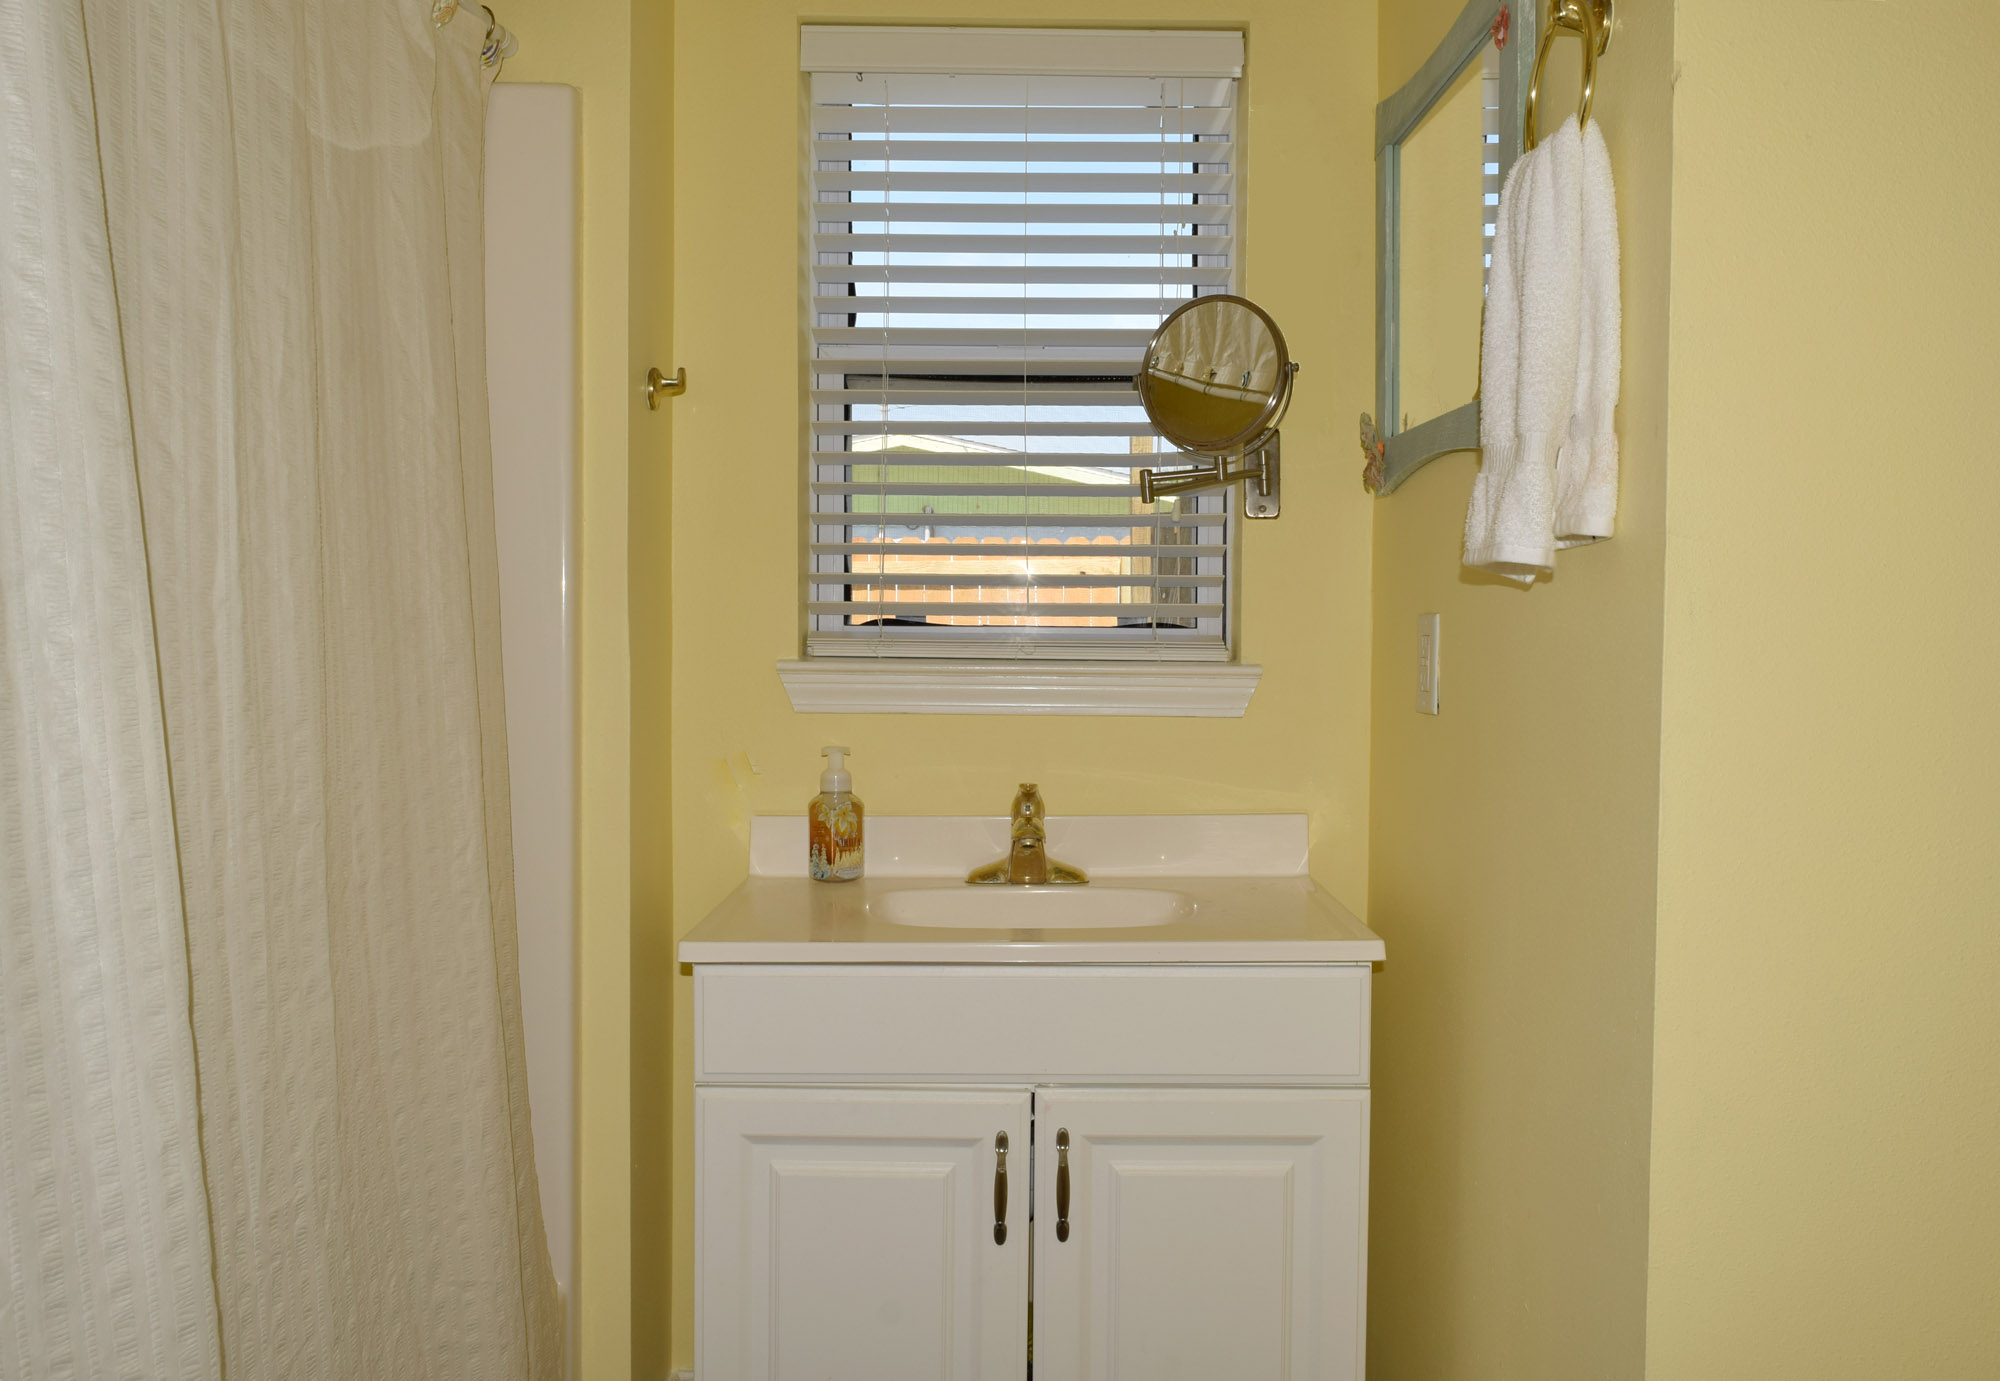 Maldonado 303 House/Cottage rental in Pensacola Beach House Rentals in Pensacola Beach Florida - #14